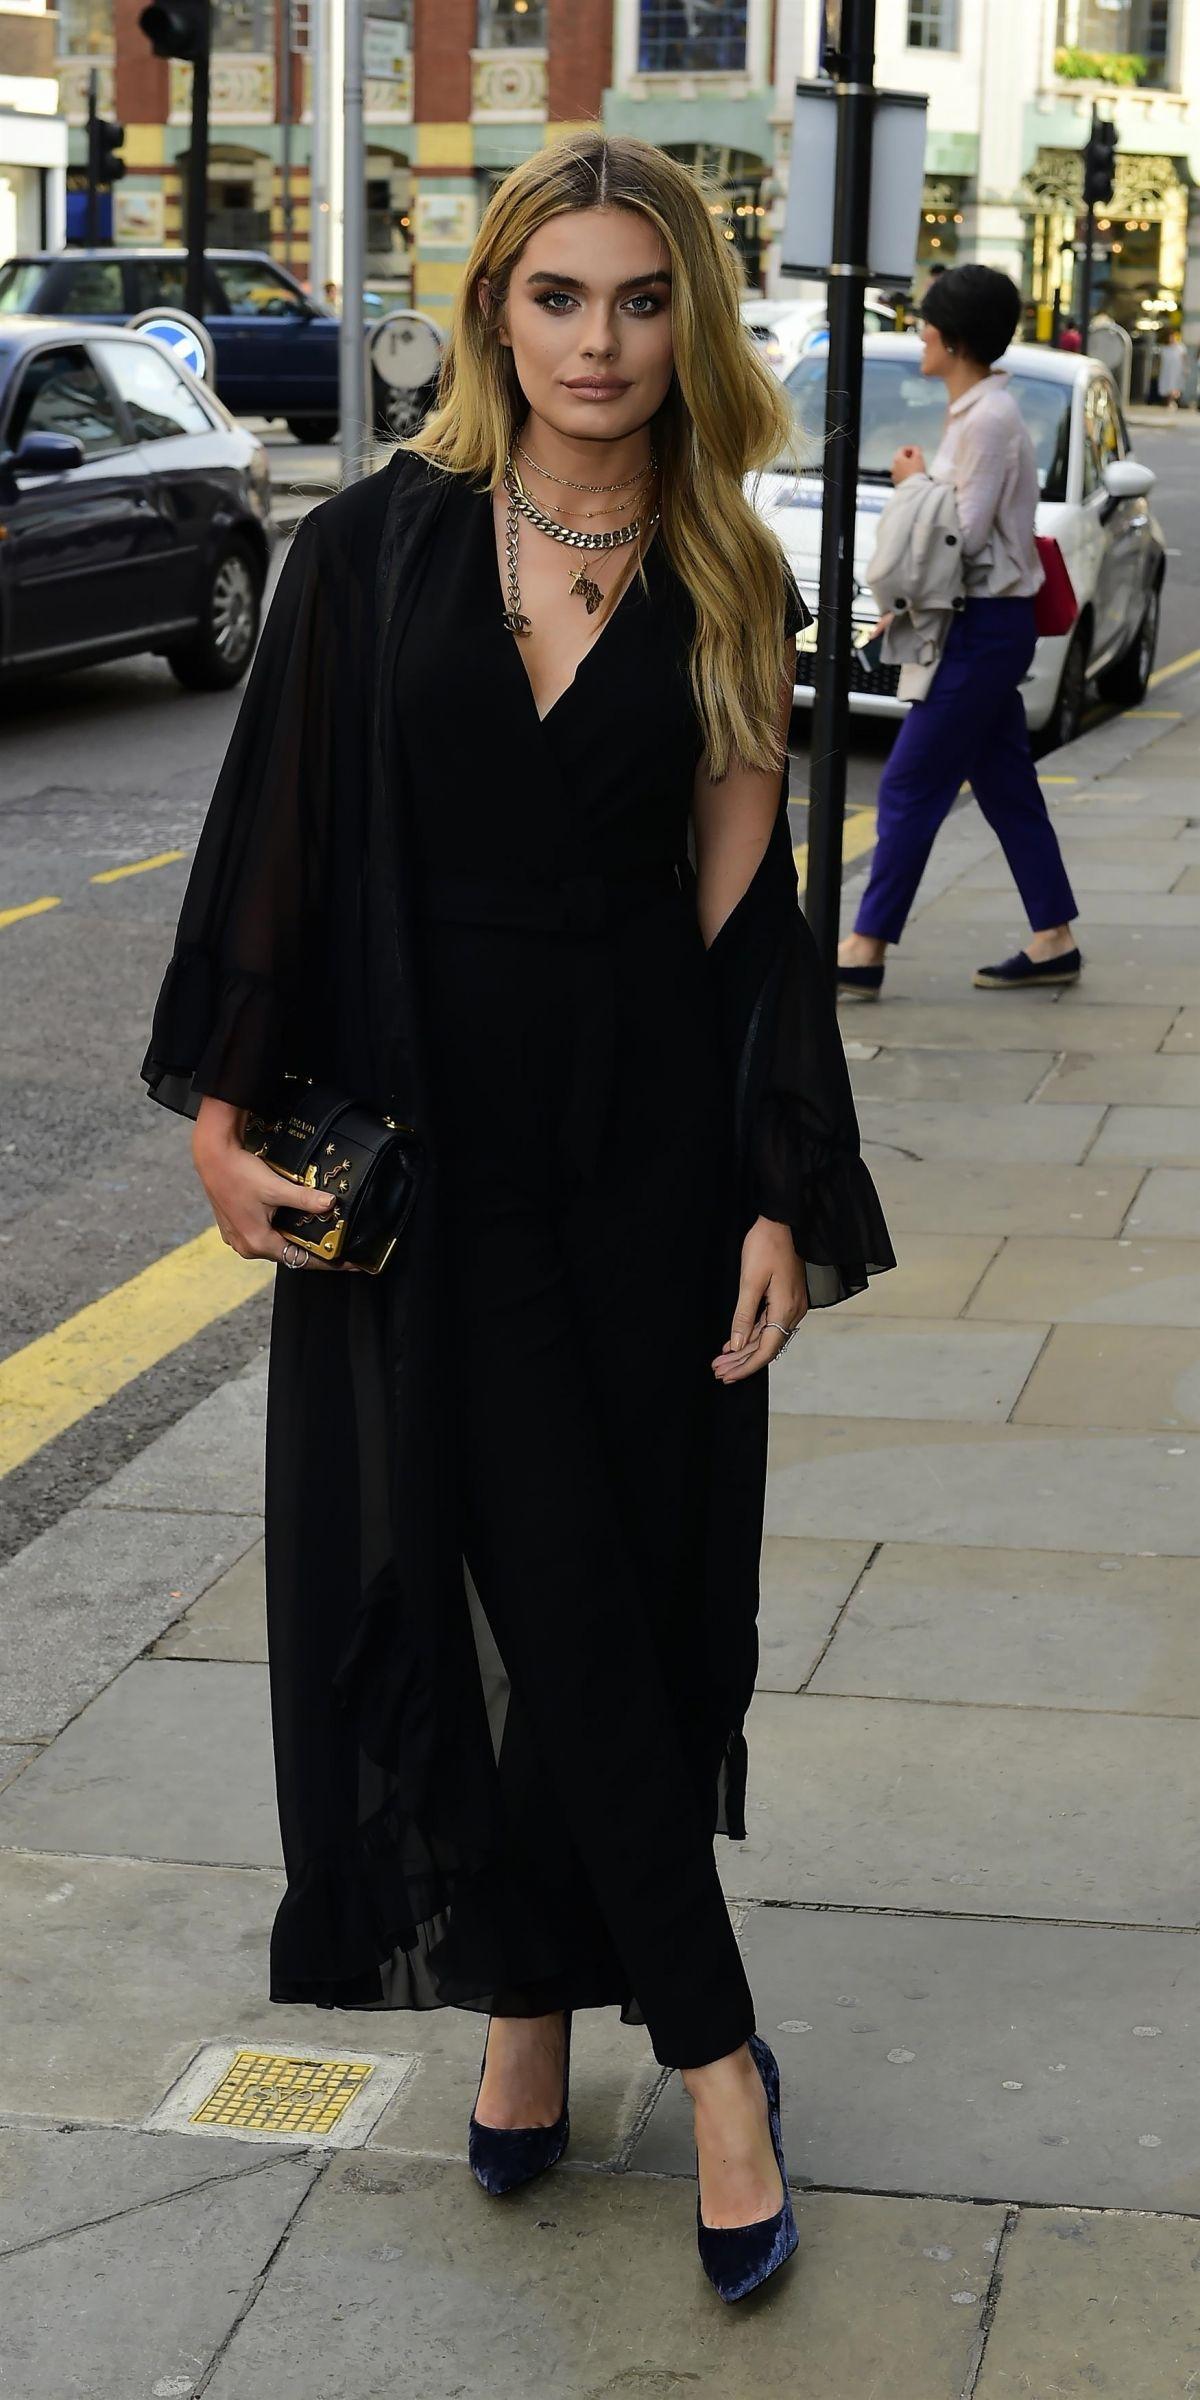 CHLOE LLOYD at Lipsey London Party in London 07/19/2017